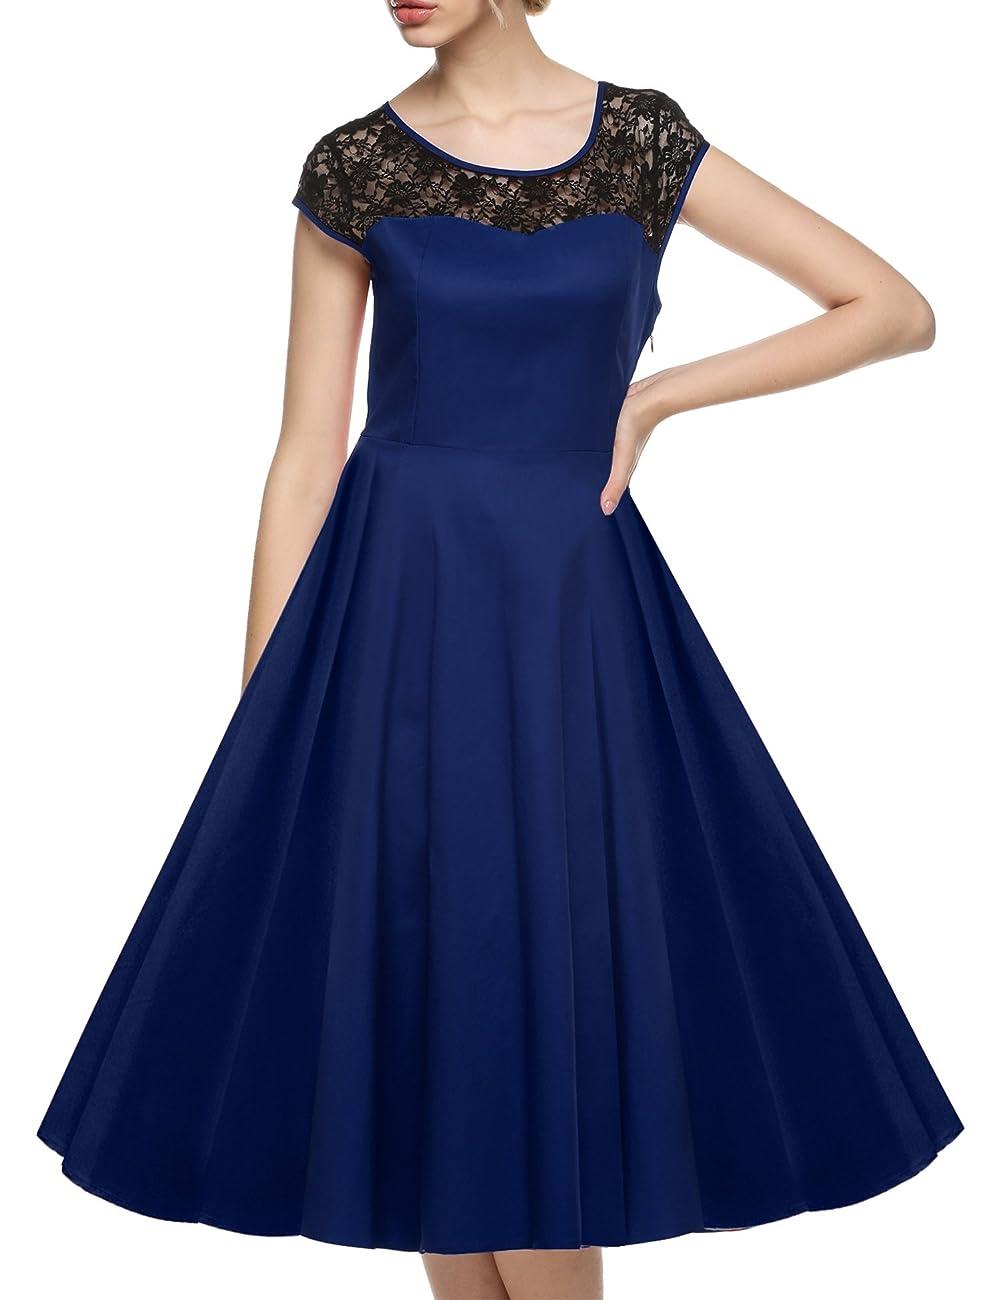 ACEVOG Women's Lace Crochet Sleeveless Cotton Vintage Tea Dress 2